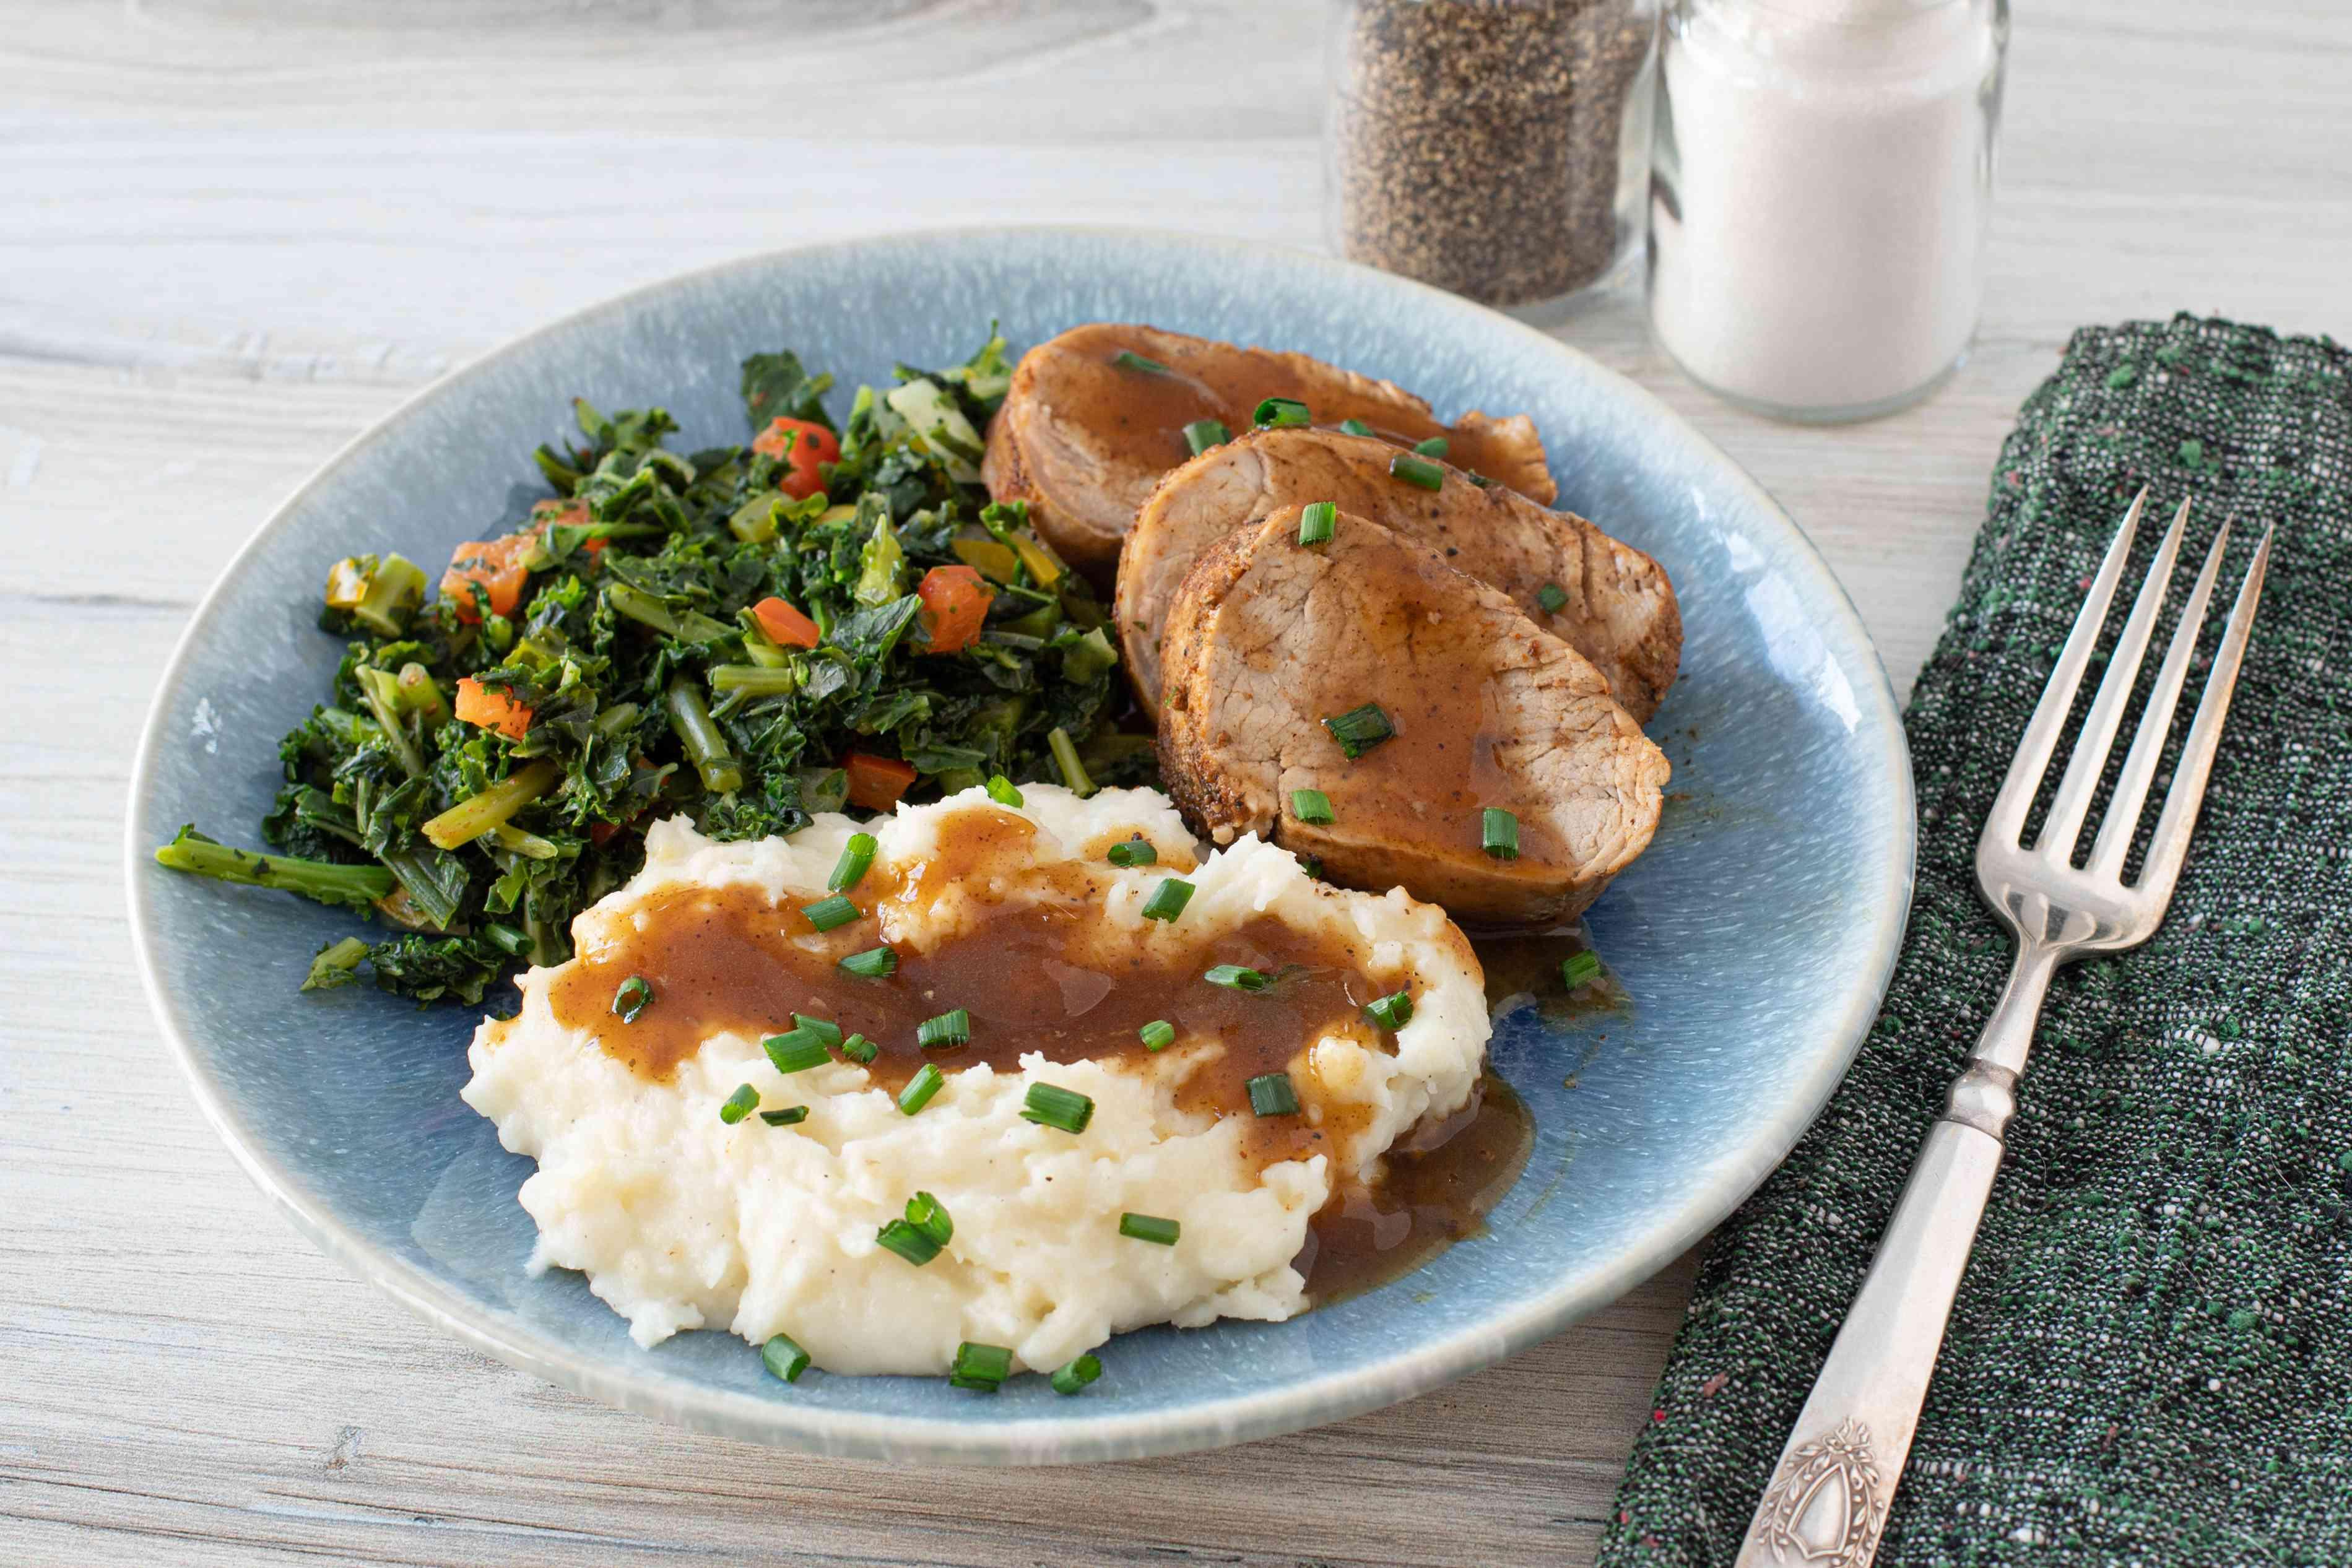 Instant Pot pork tenderloin with potatoes and kale